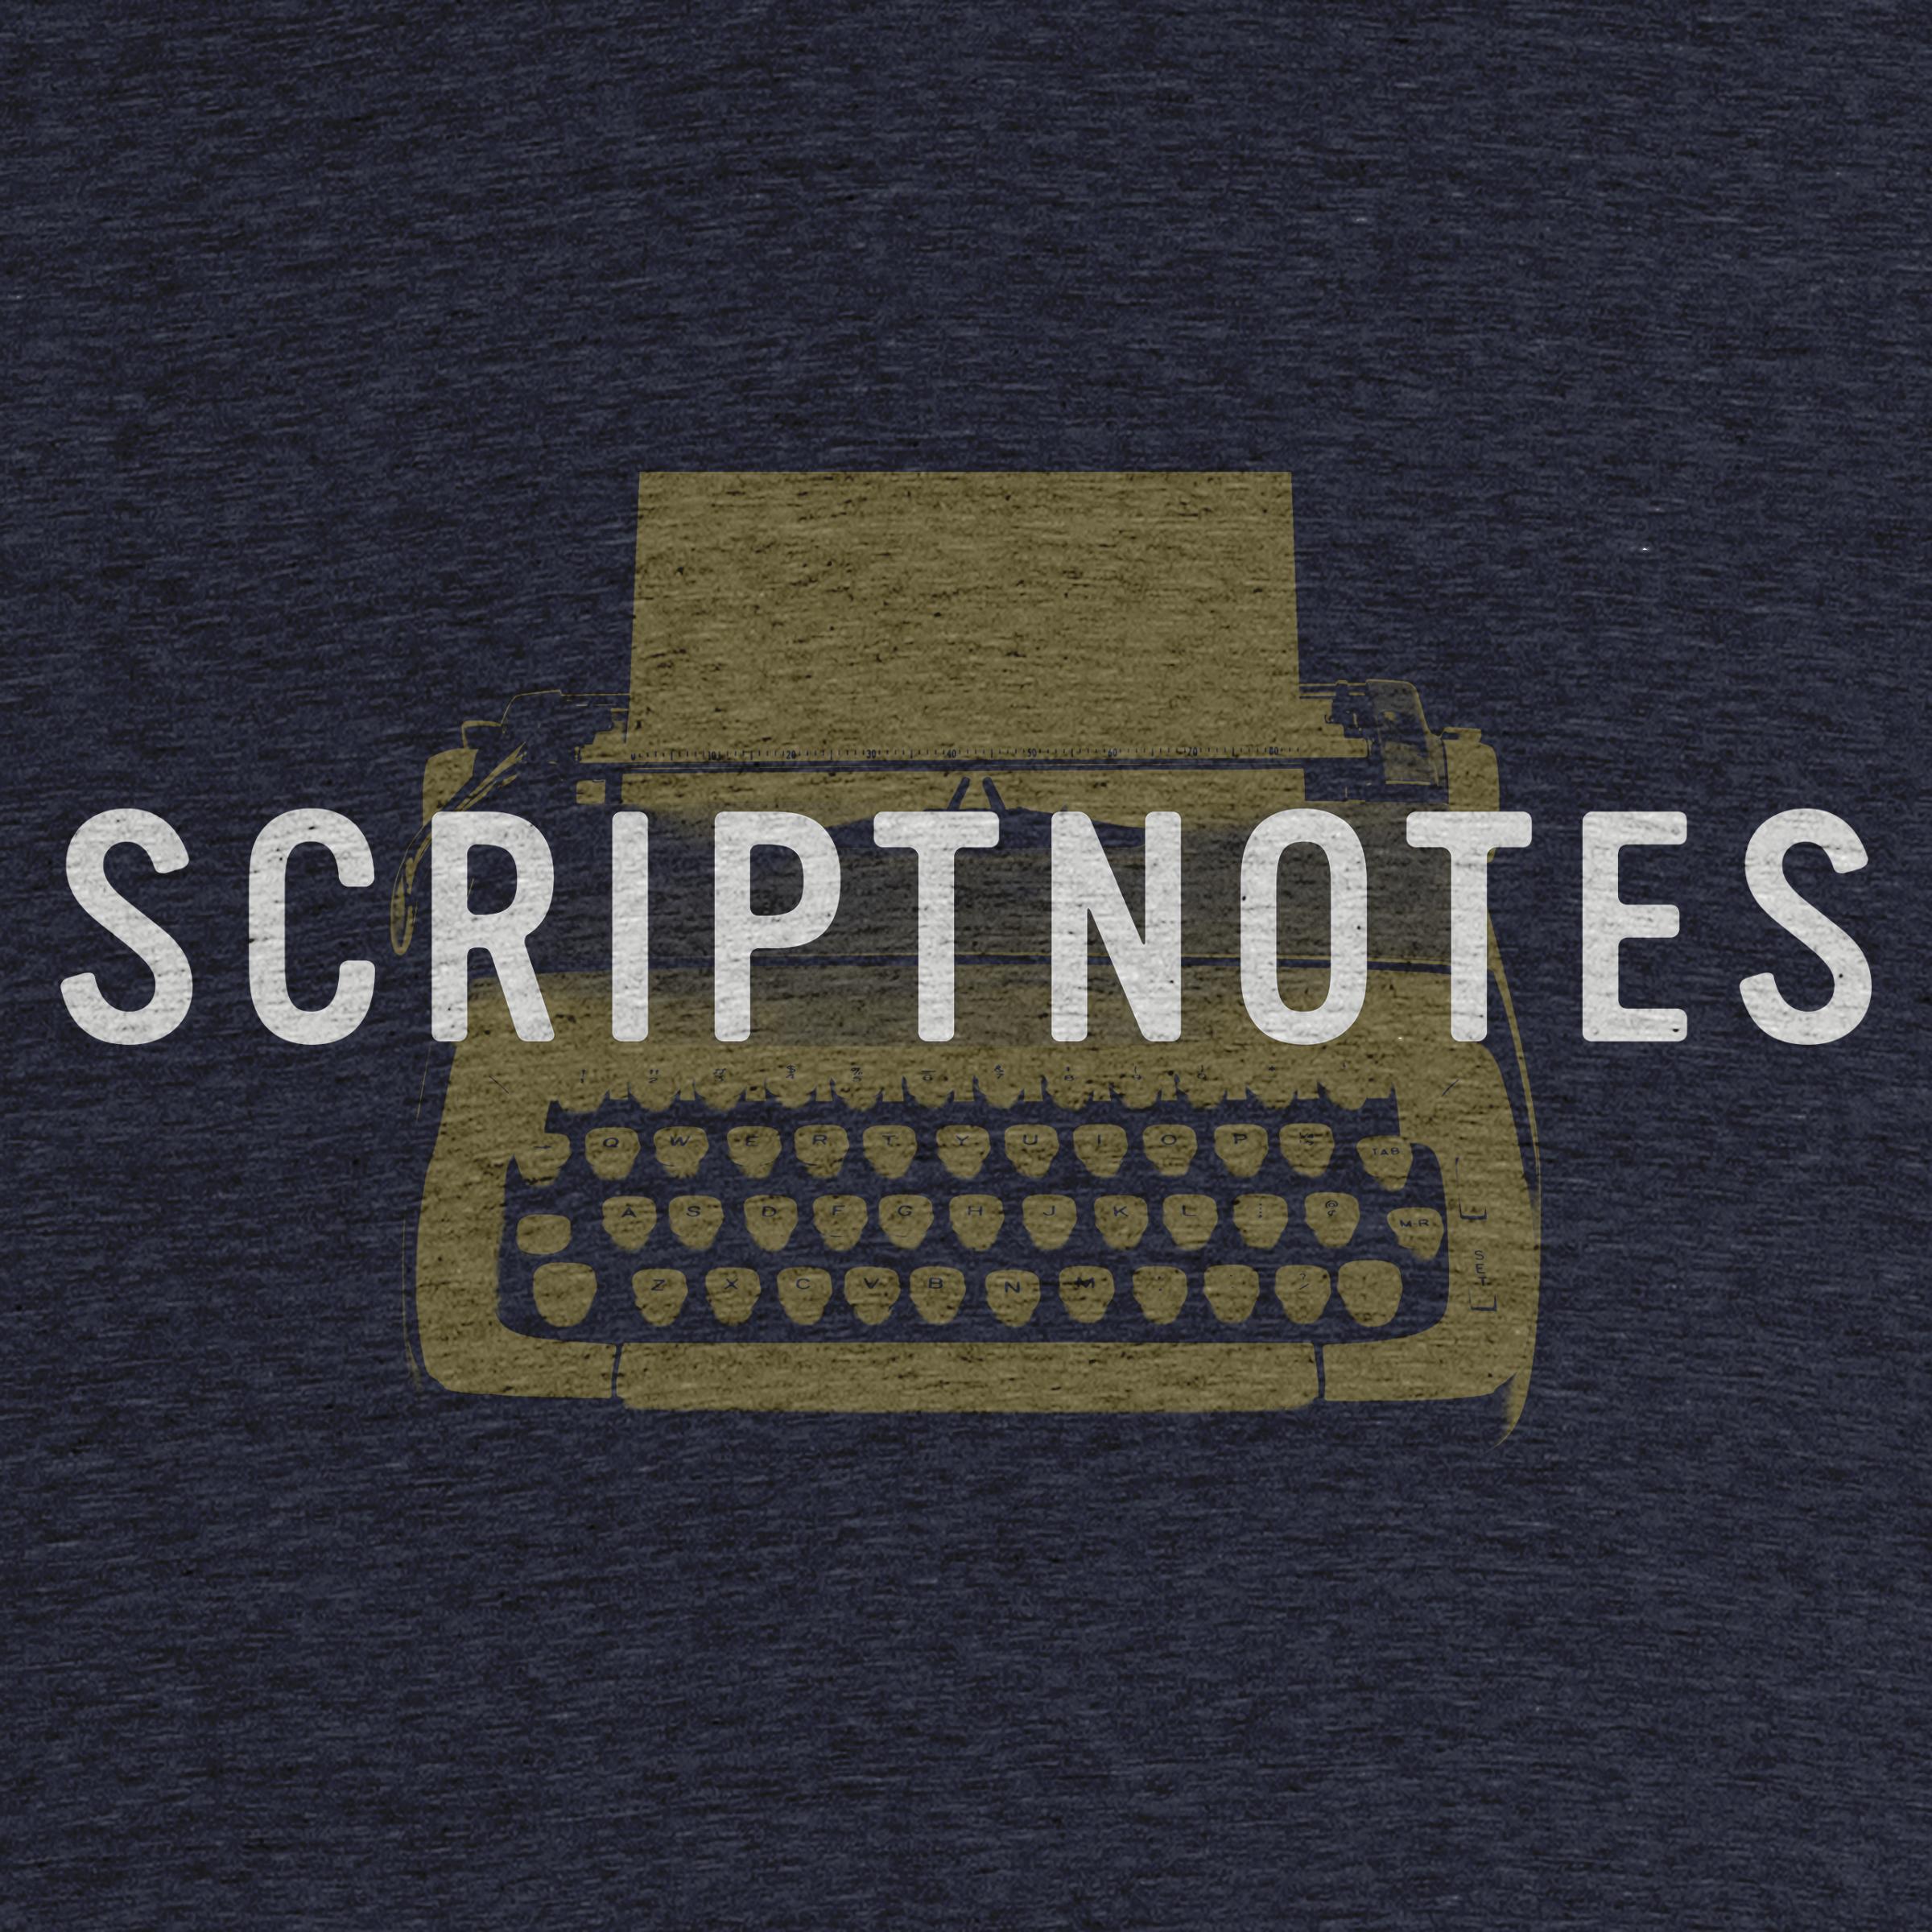 Scriptnotes Classic Detail